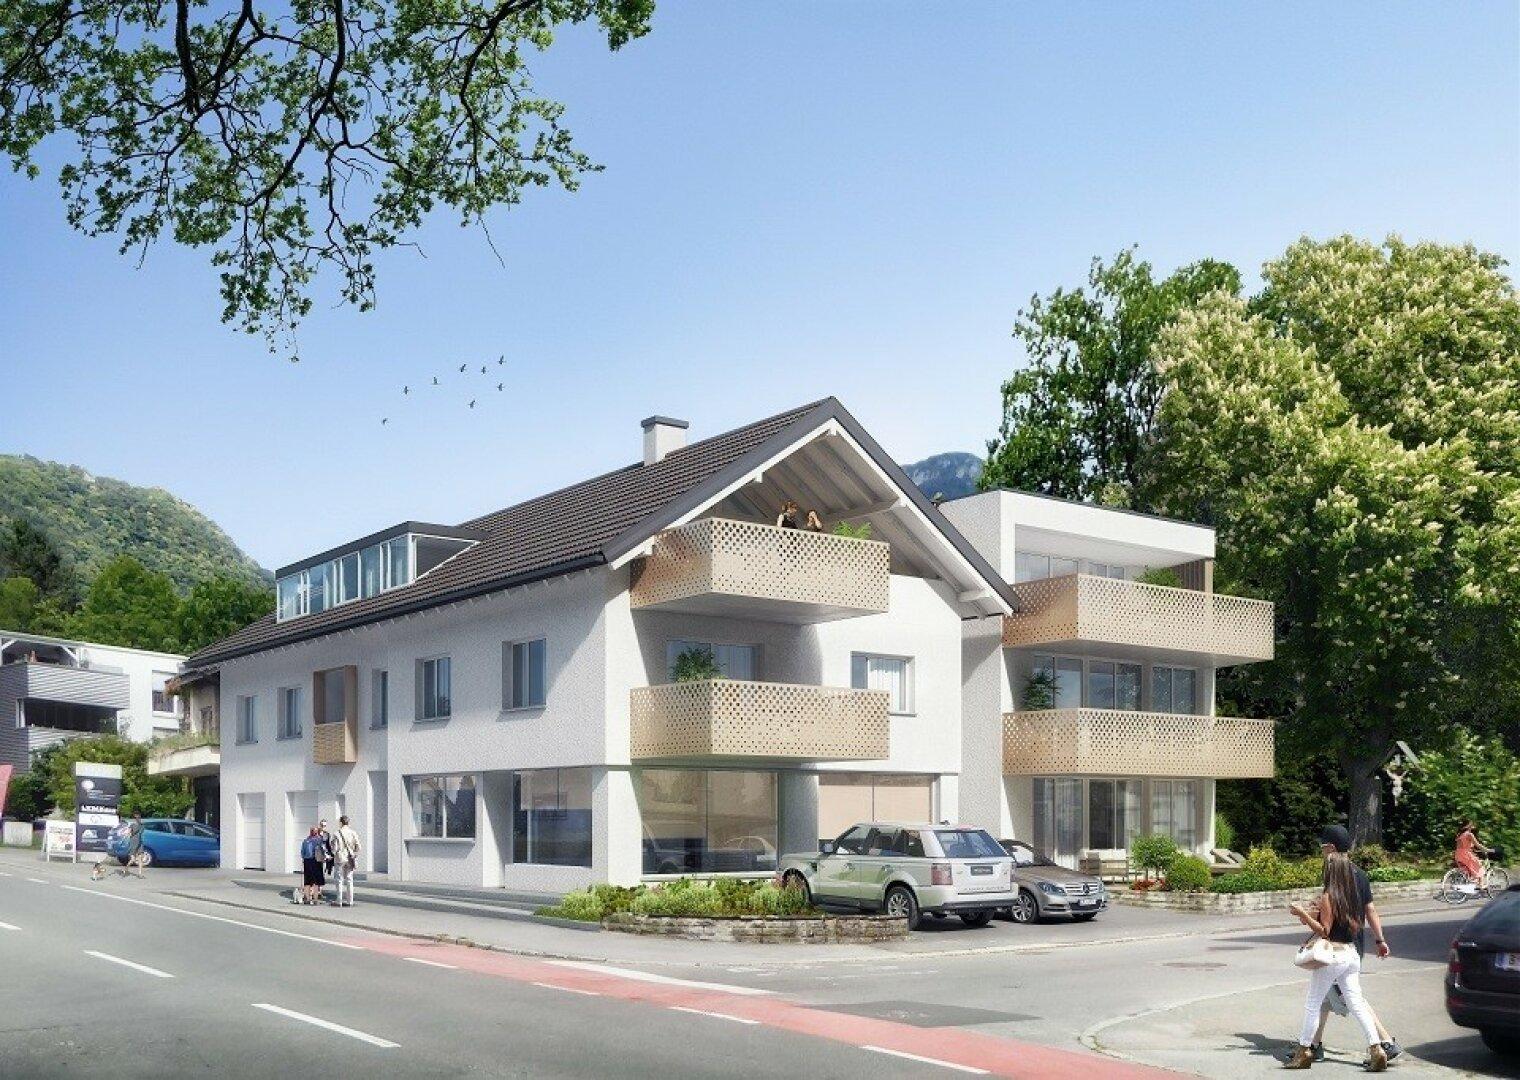 Nähe Zentrum Hohenems